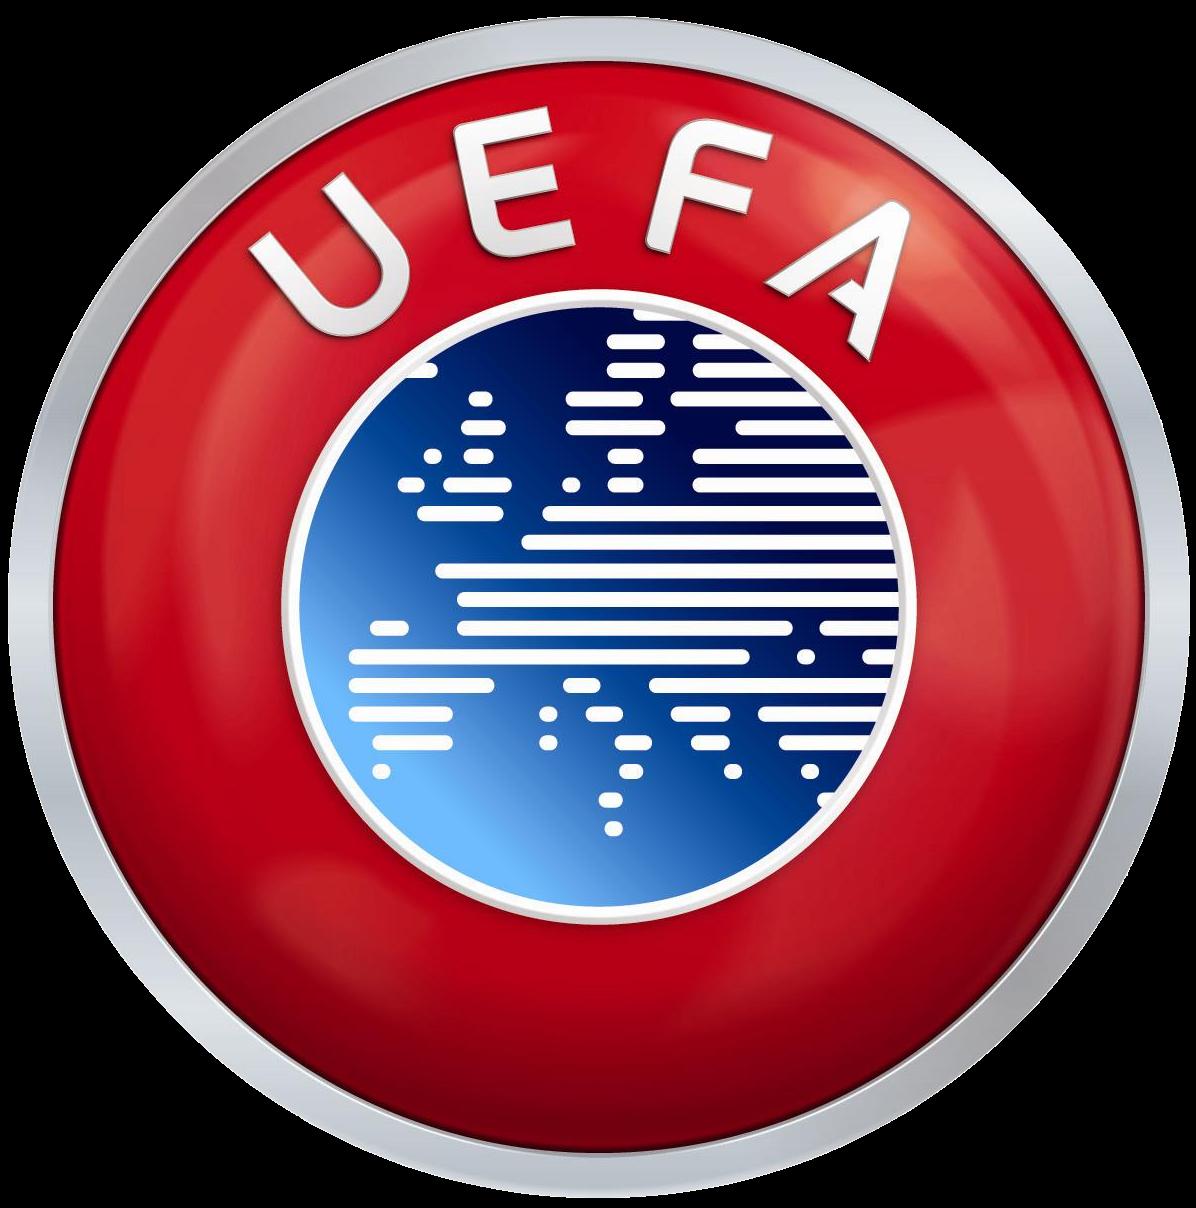 Go to UEFA